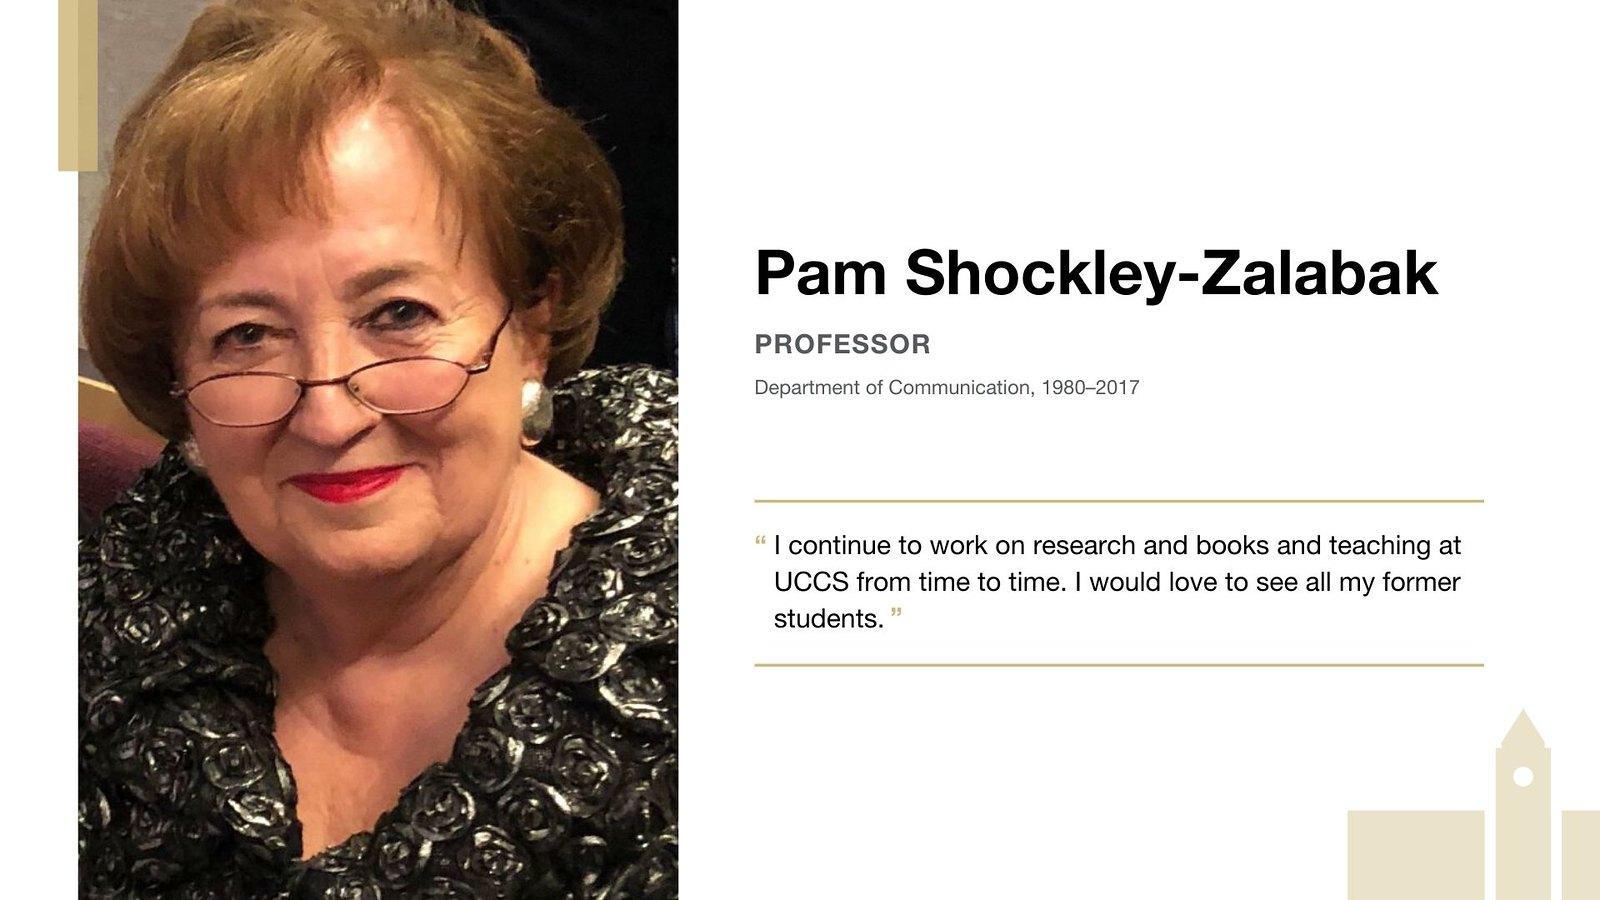 11-Pam Shockley-Zalabak